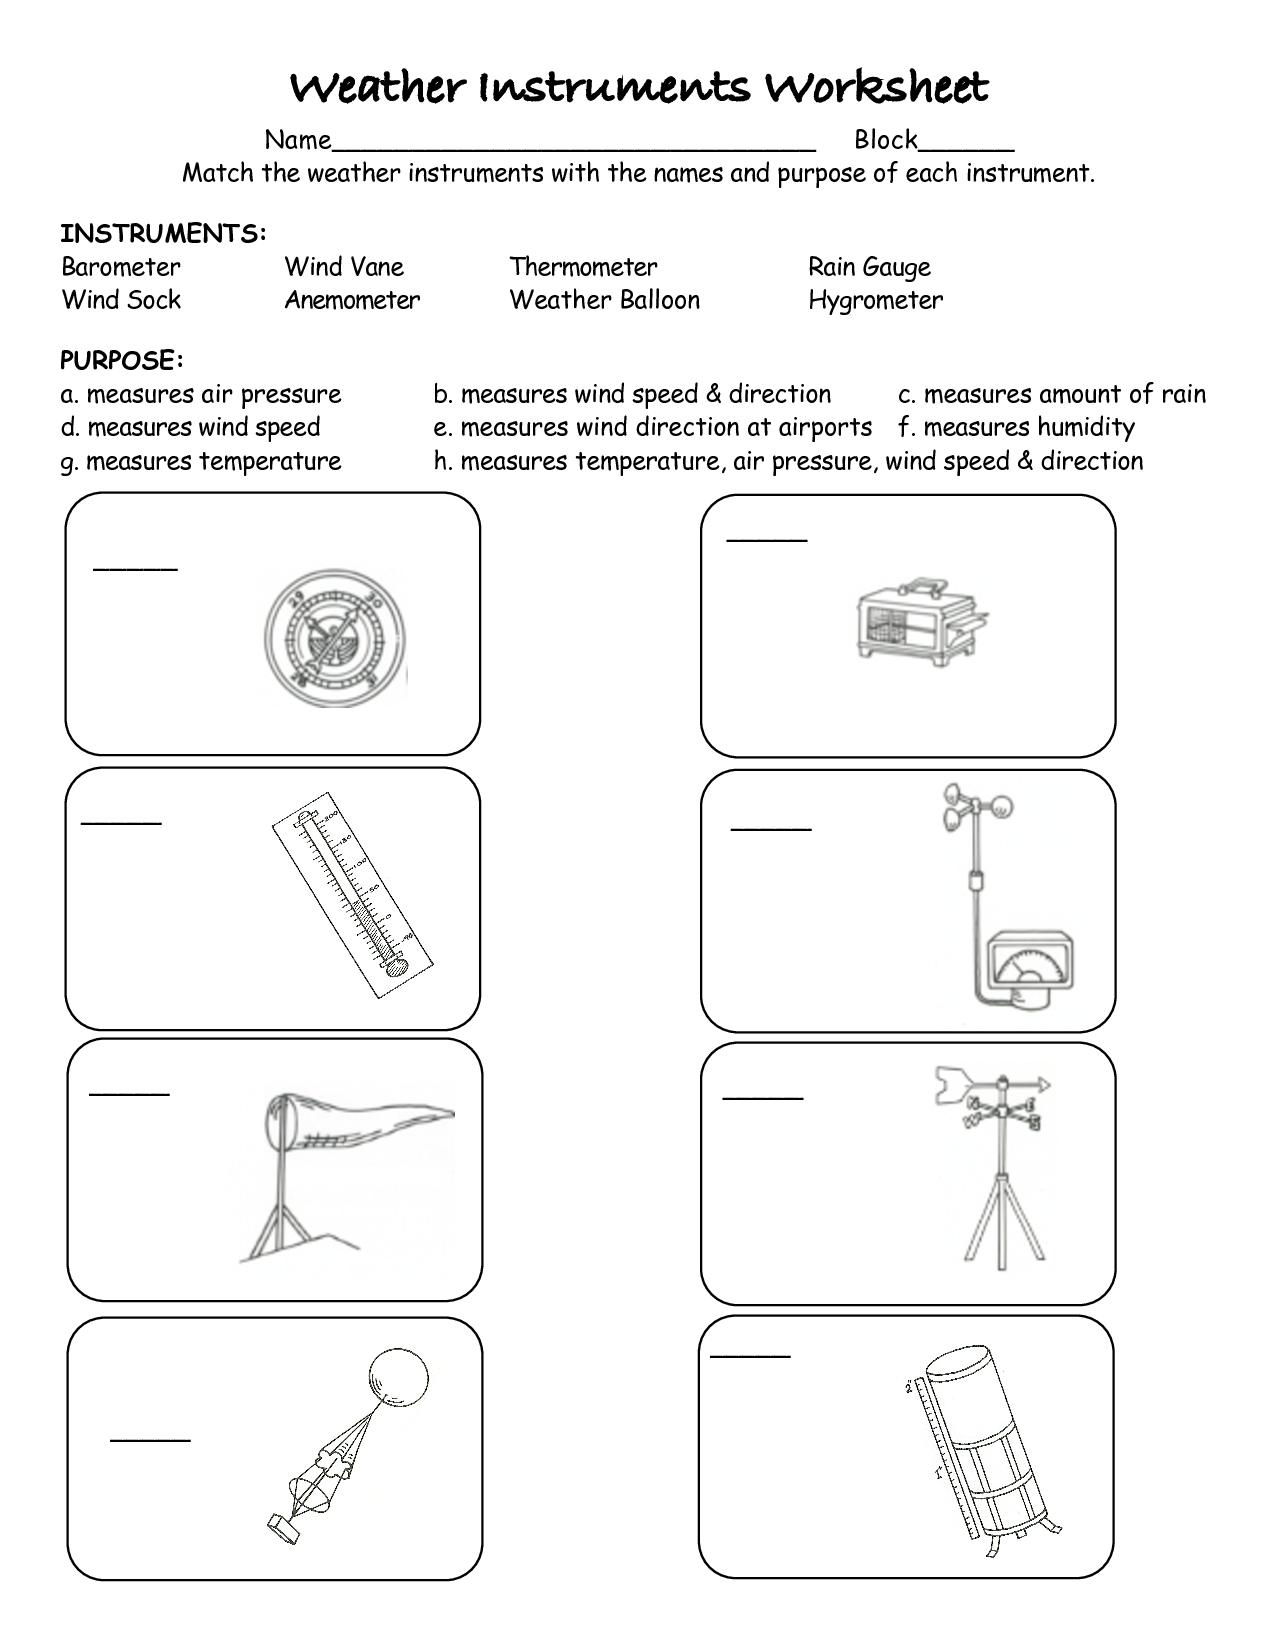 Worksheets weather instruments pdf also recipes rh pinterest